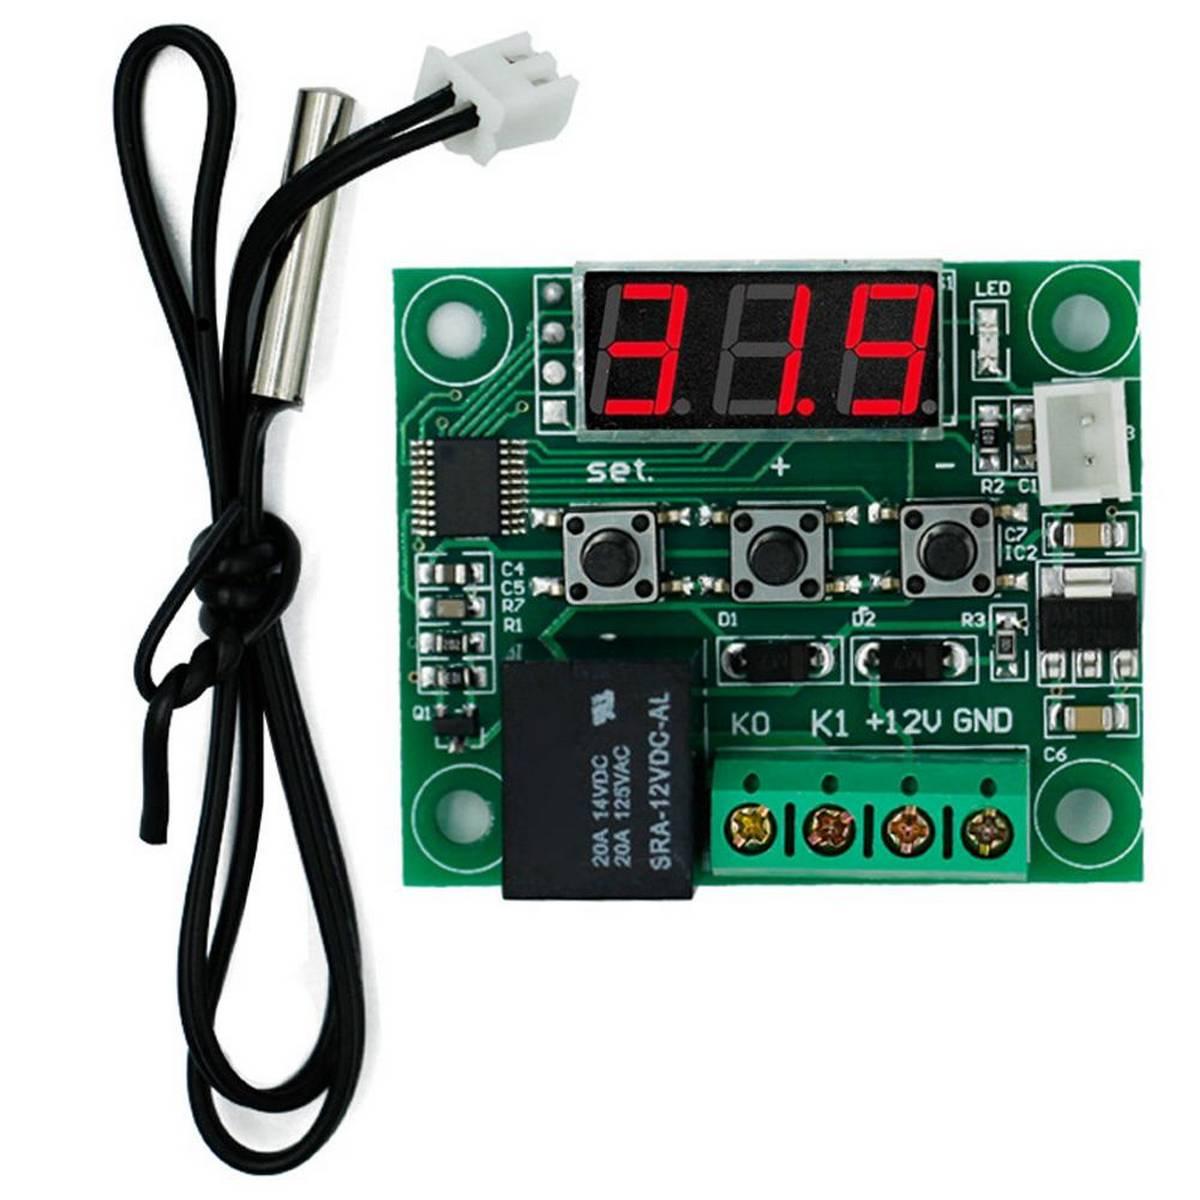 W1209/XH-W1209/HW-557 Digital Thermostat Temperature Controller Incubator Controller